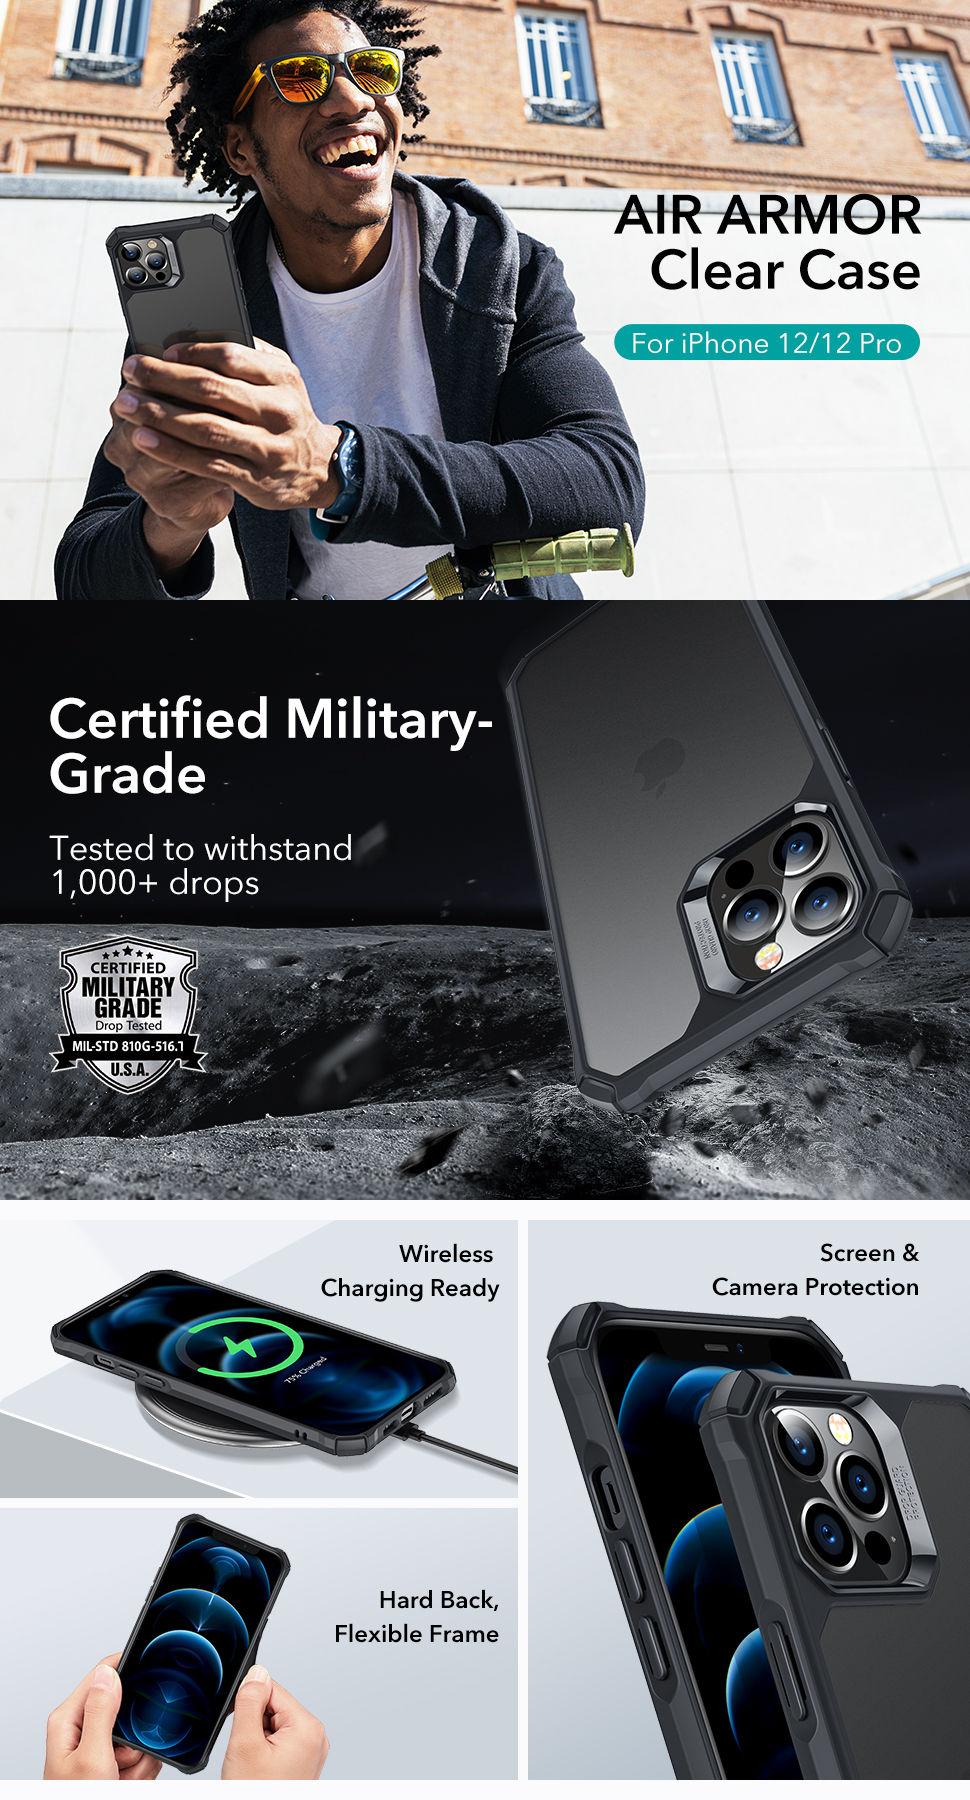 Gohub Shop - ESR Air Armor - Black case for iPhone 12/12 Pro